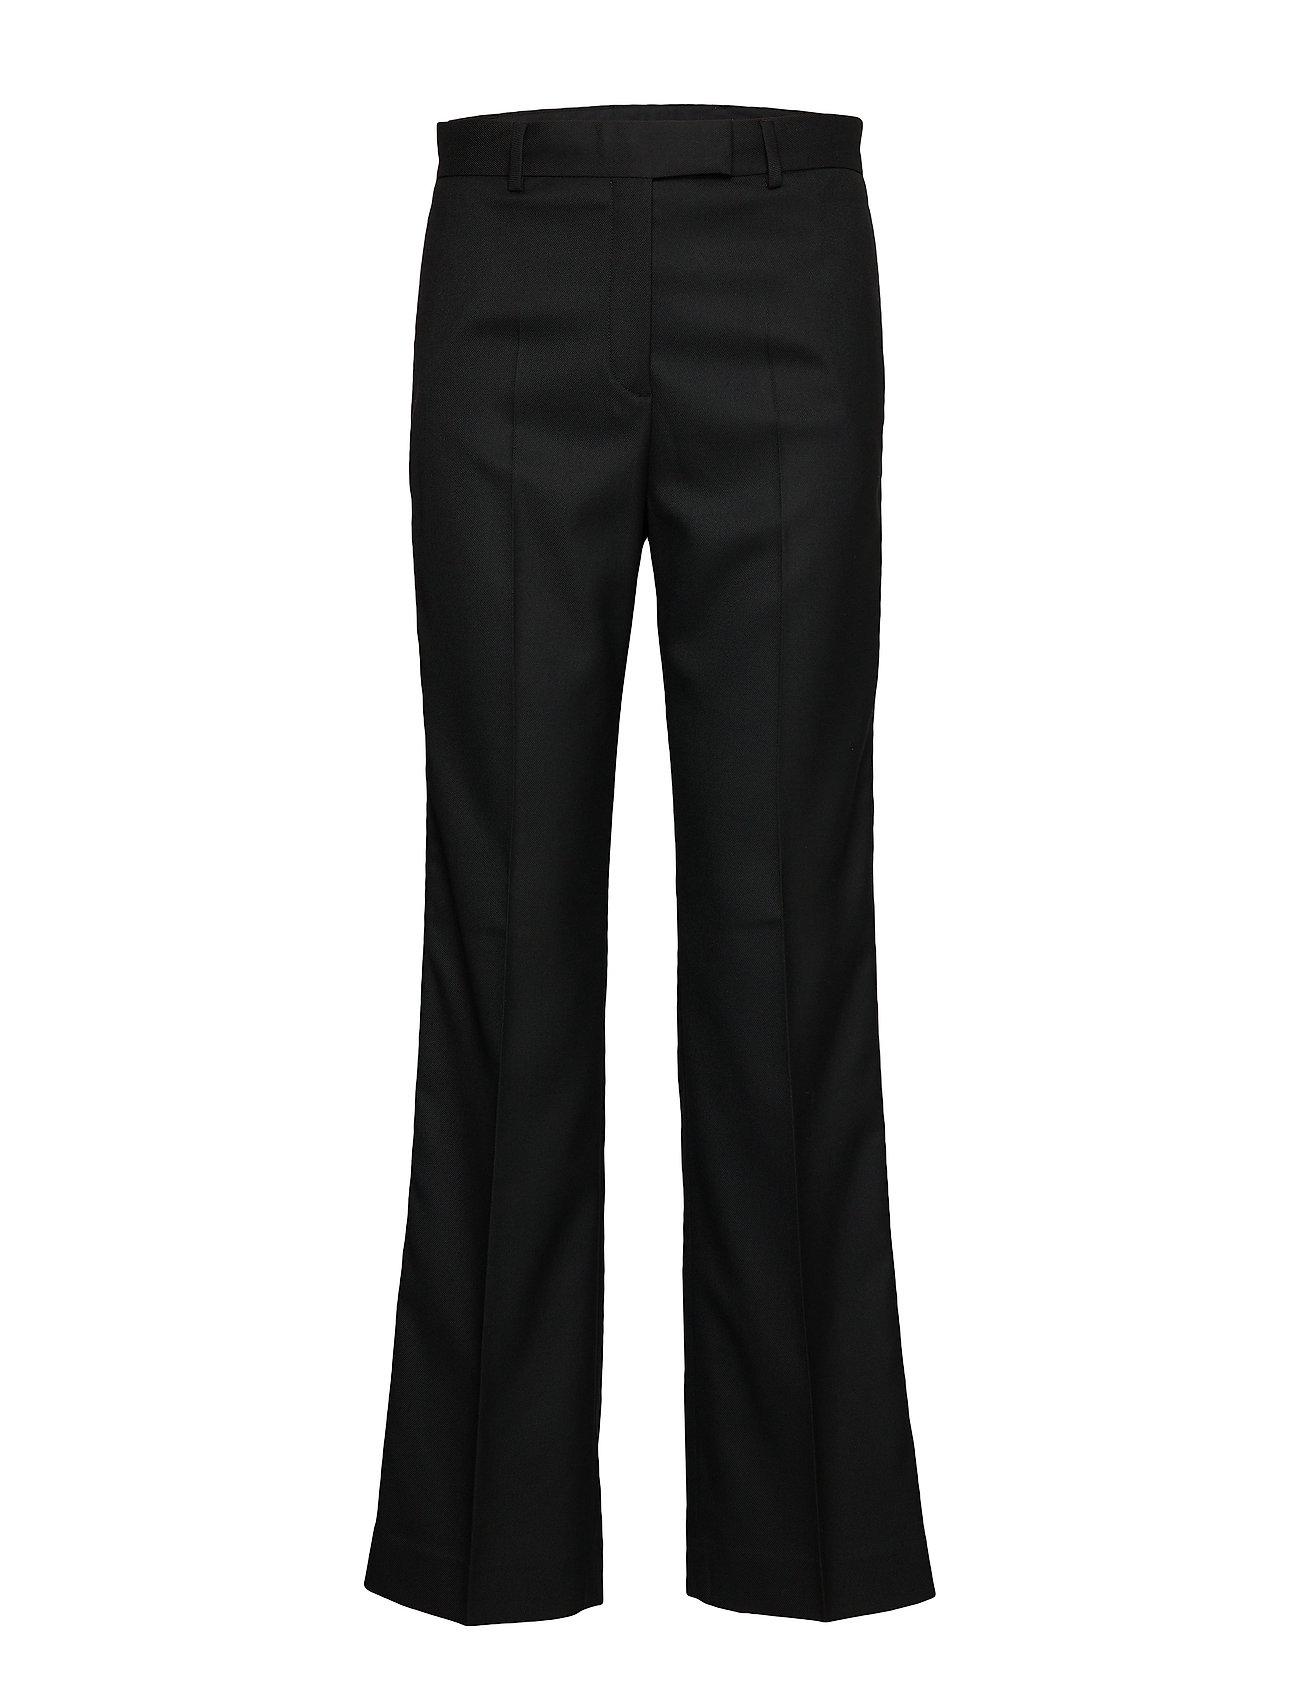 Calvin Klein FINE TWILL WIDE LEG PANT - CALVIN BLACK